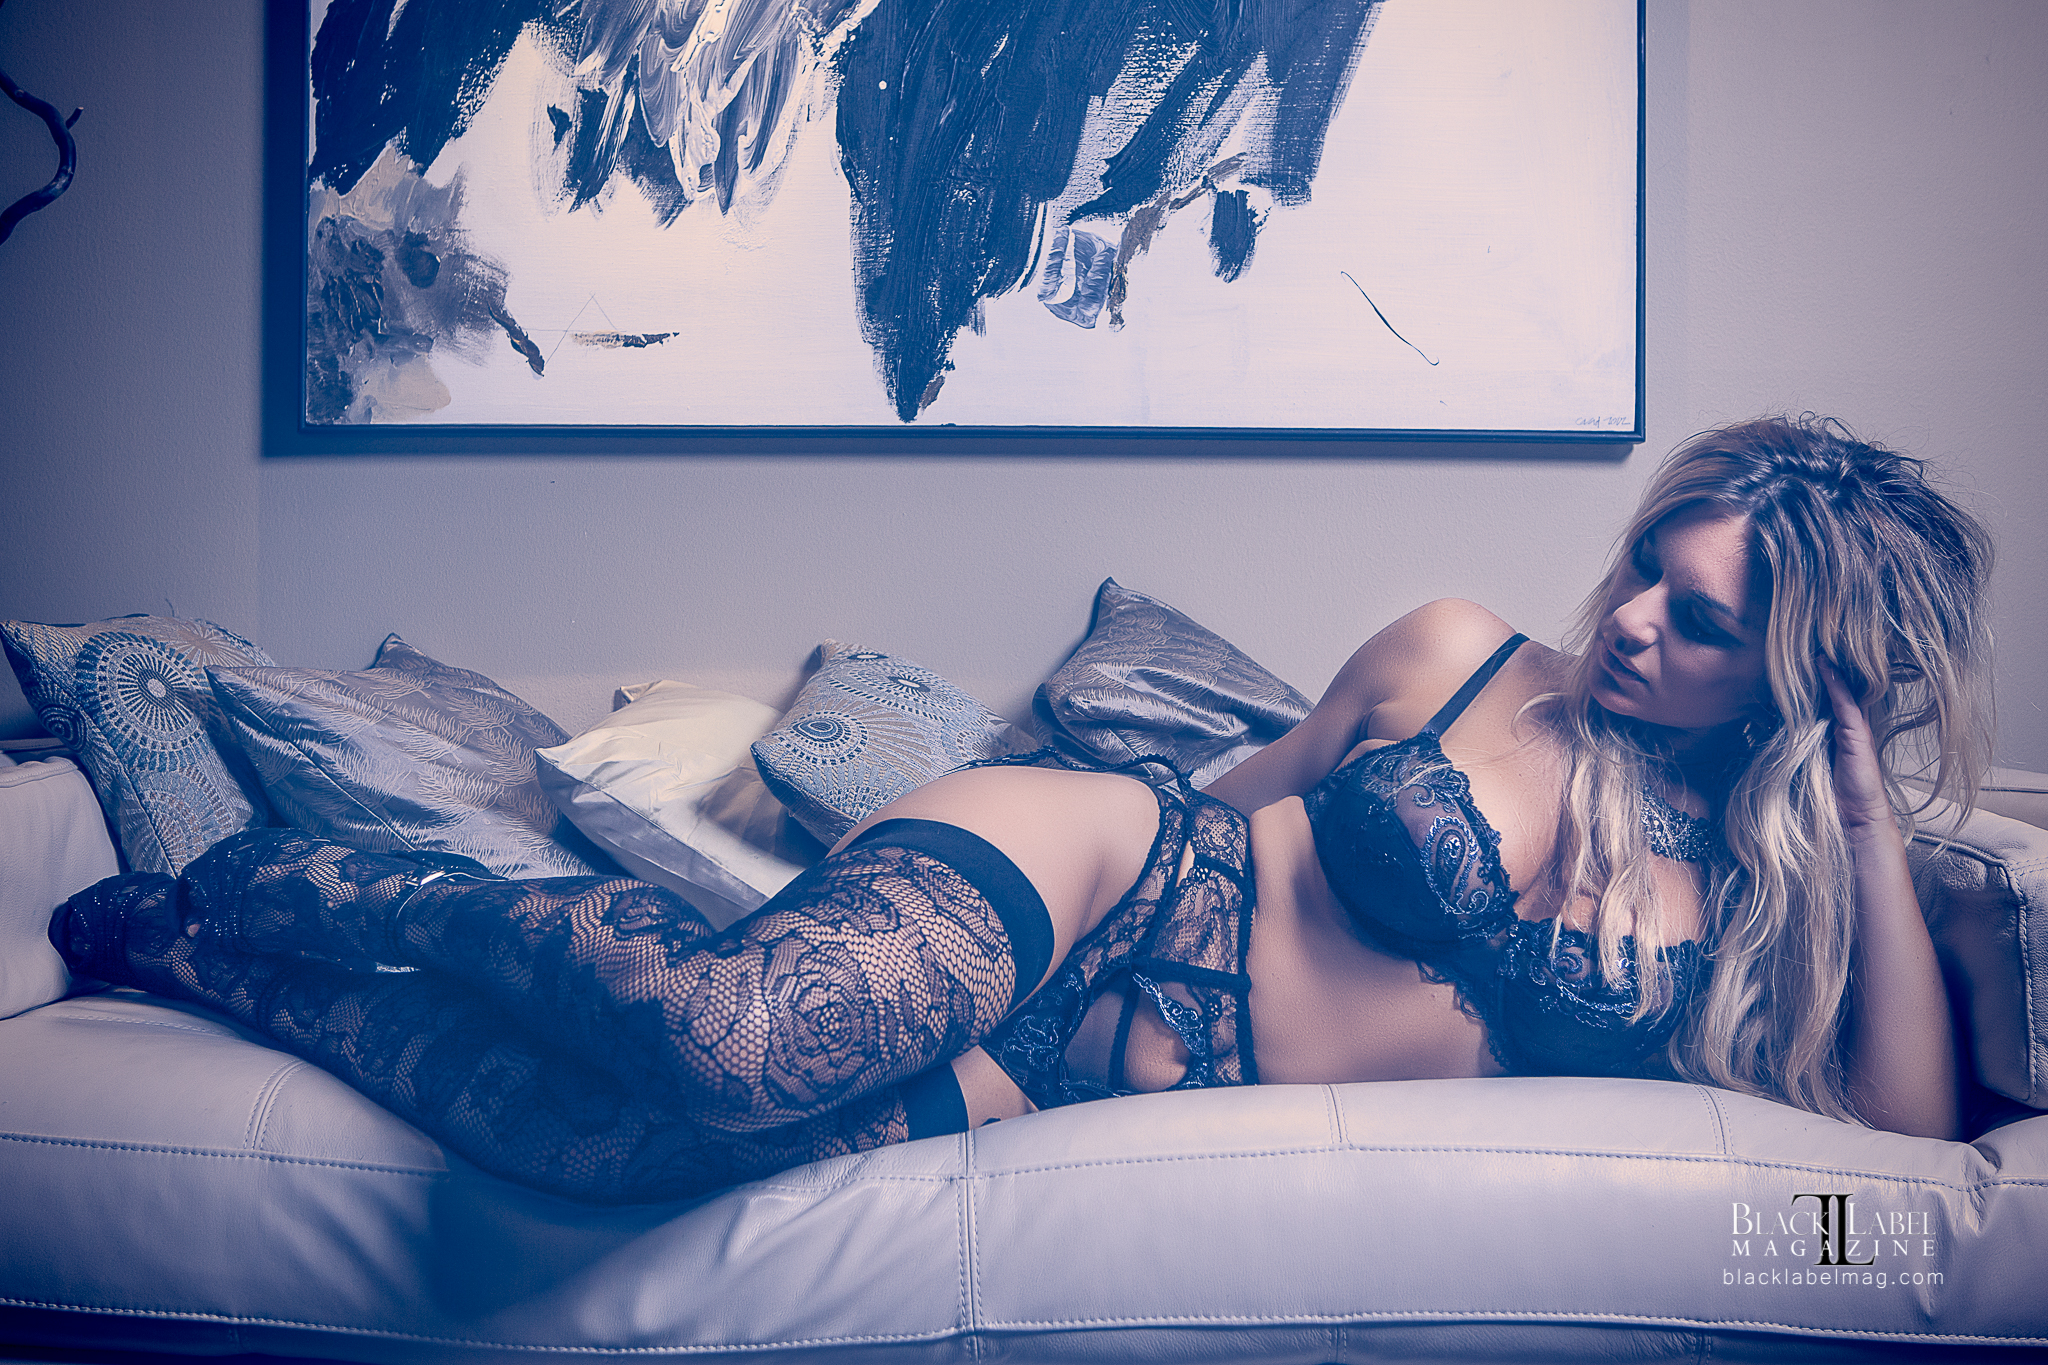 nude art magazine, Black Label Magazine, lingerie, Lise Charmel, sexy, boudoir images